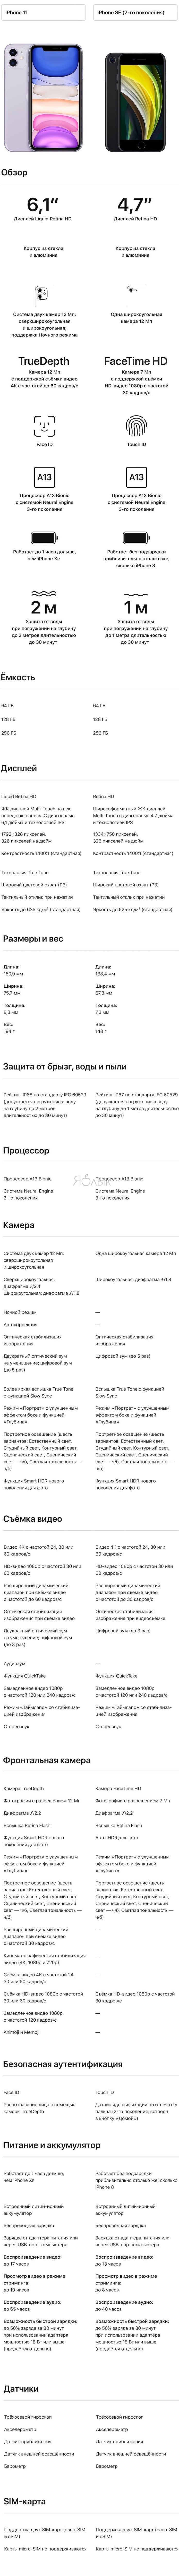 Технические характеристики iPhone SE 2020 года